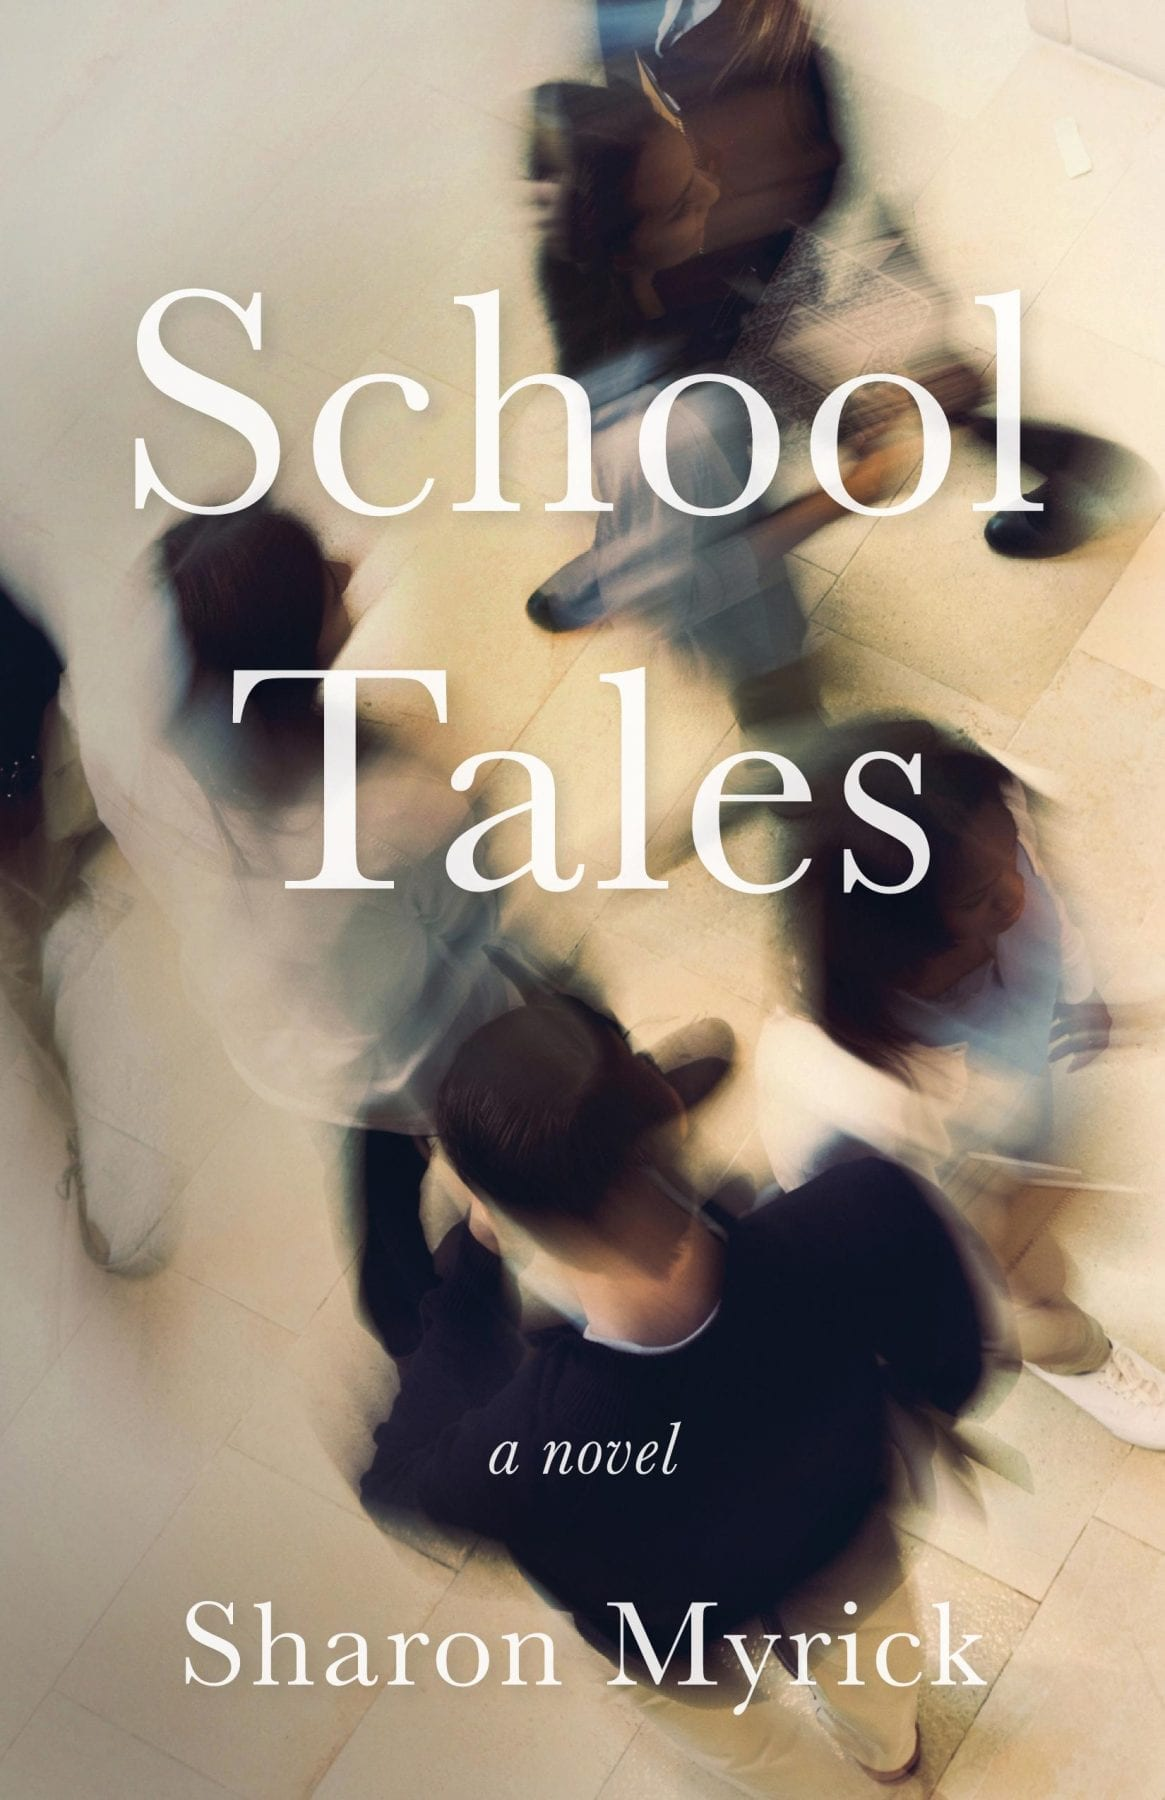 School Tales by Sharon Myrick